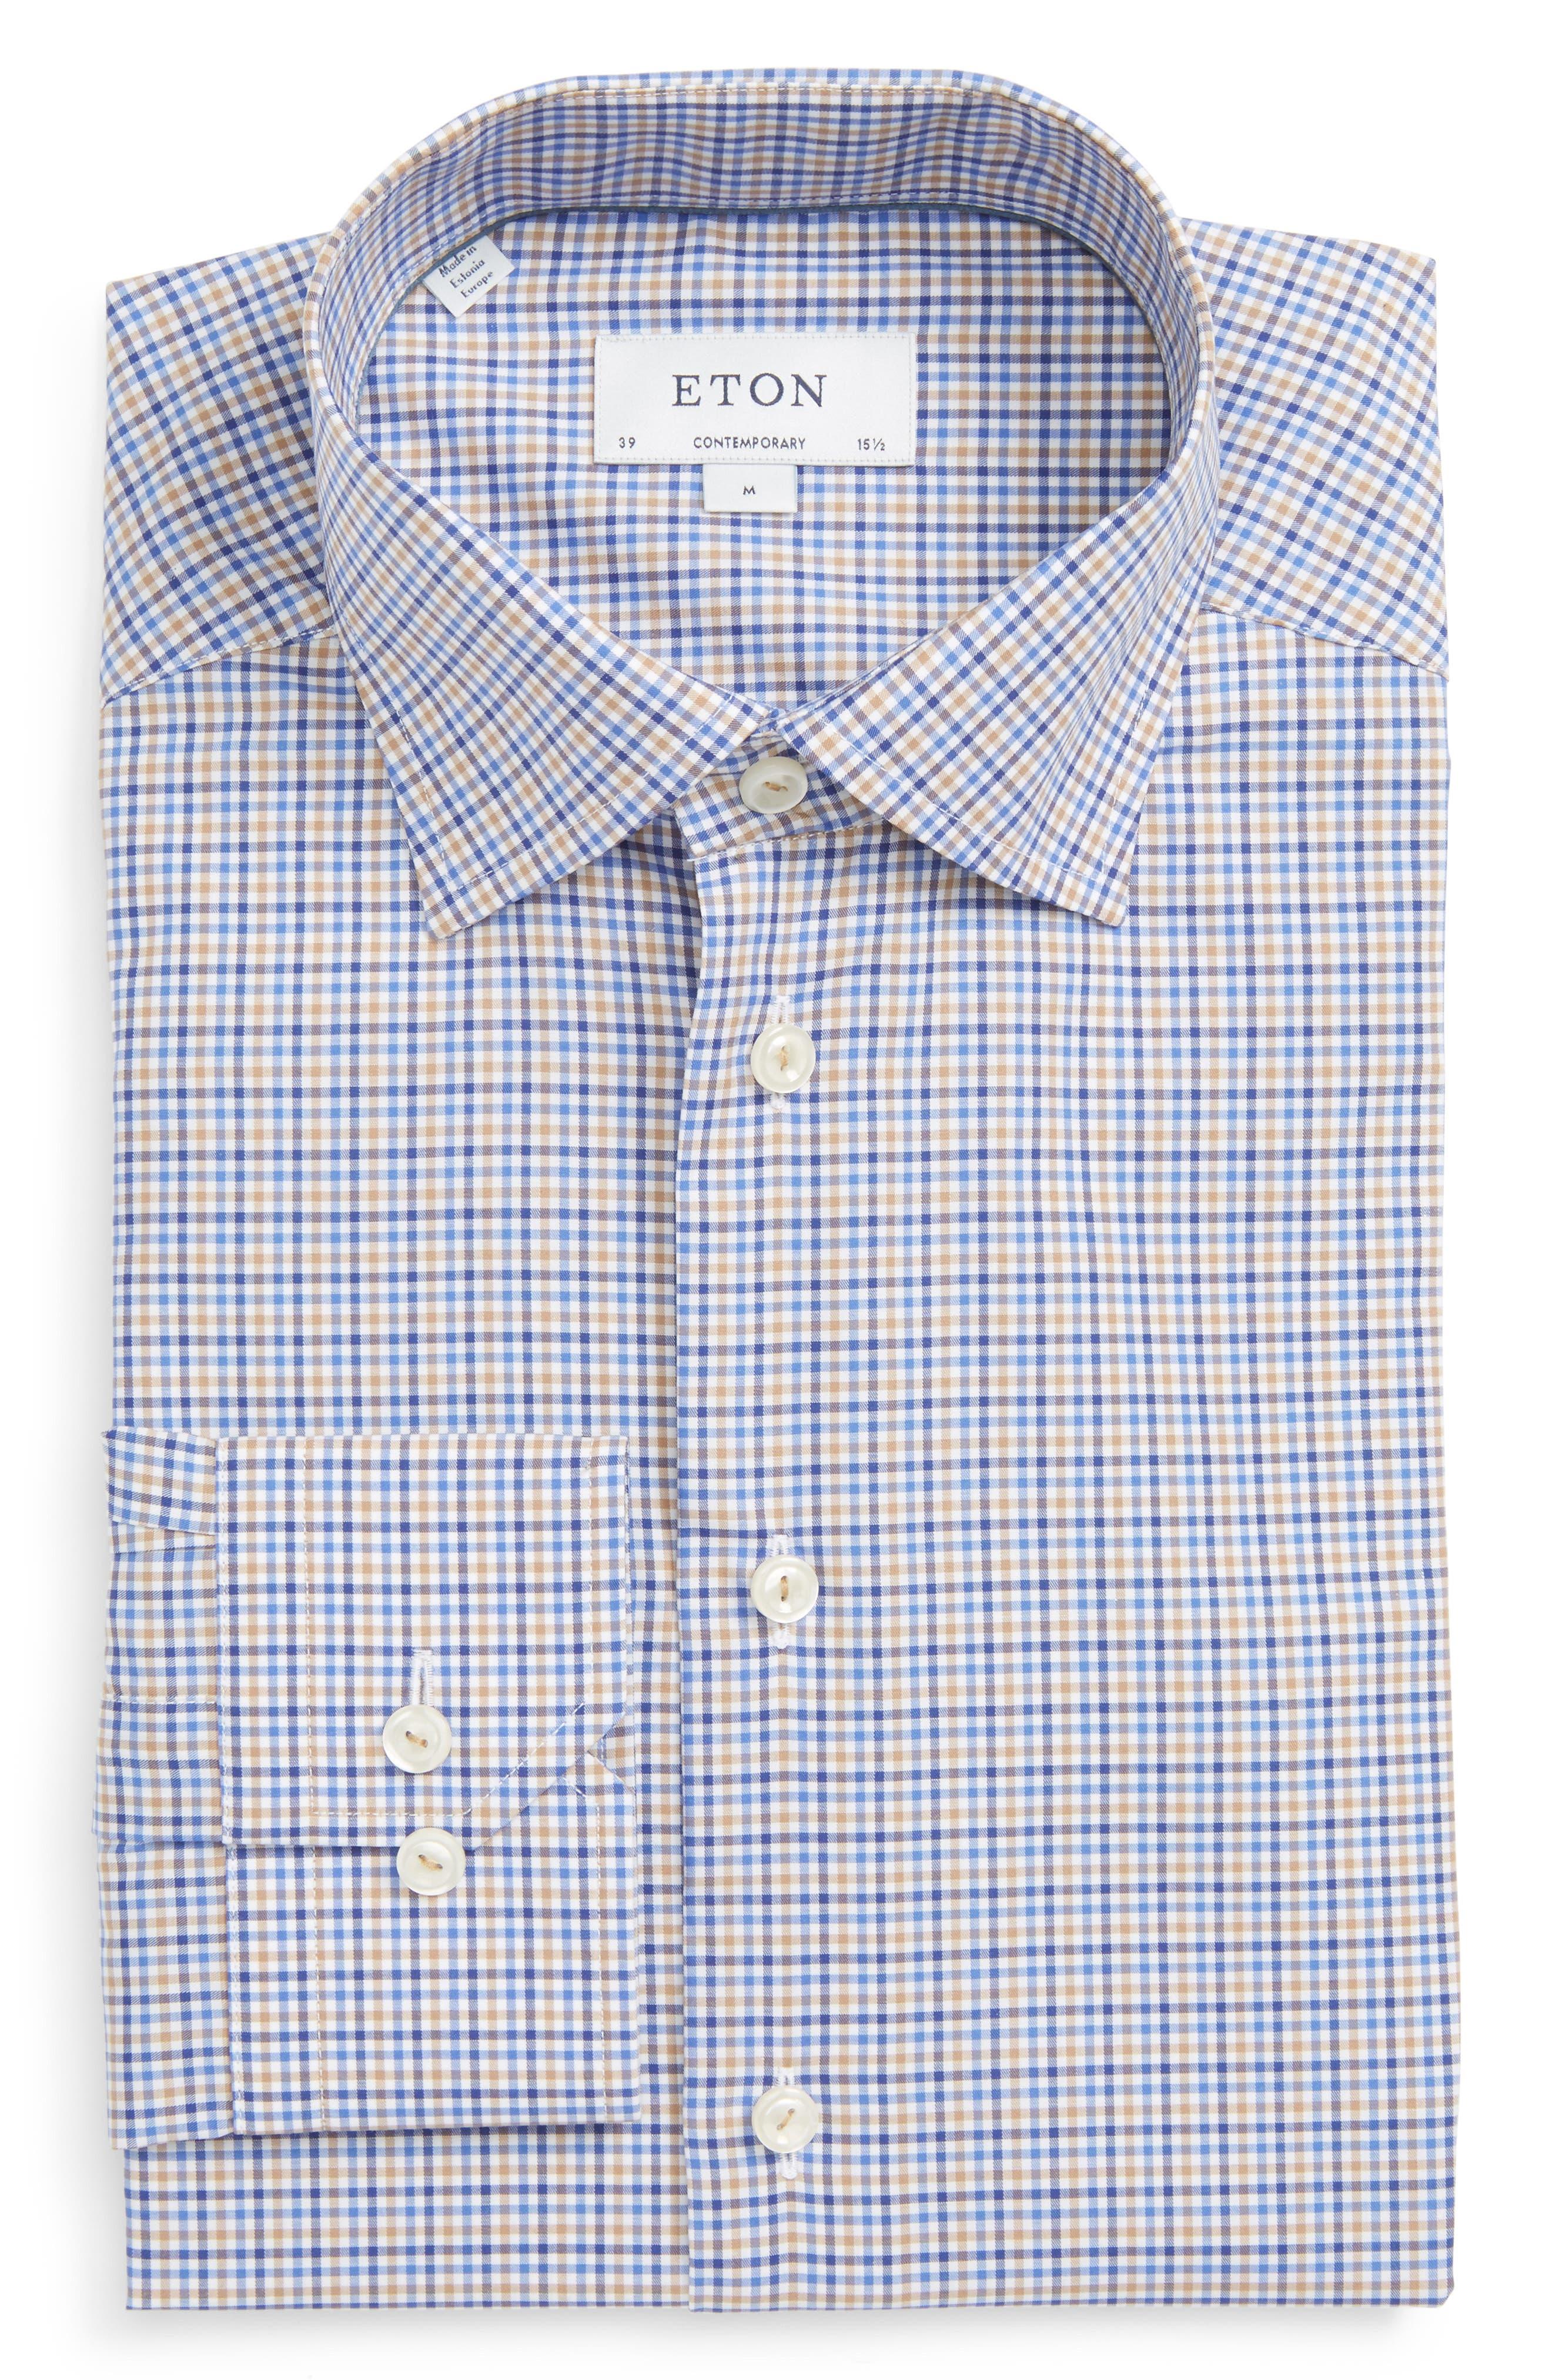 Contemporary Fit Check Dress Shirt,                         Main,                         color, Blue/ Tan